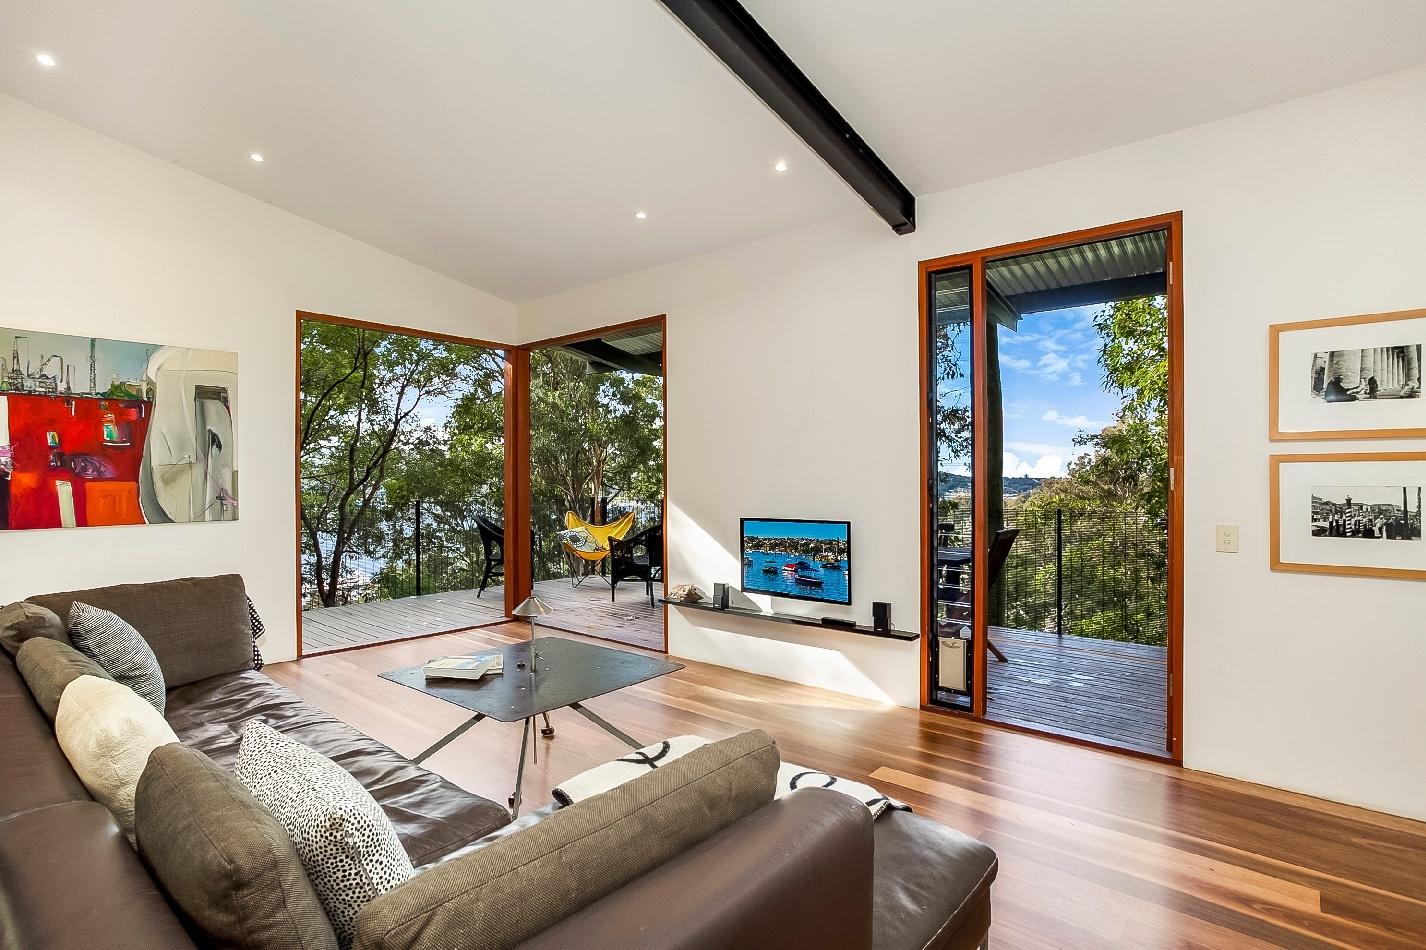 Modern Architecture Providing Total Serenity!